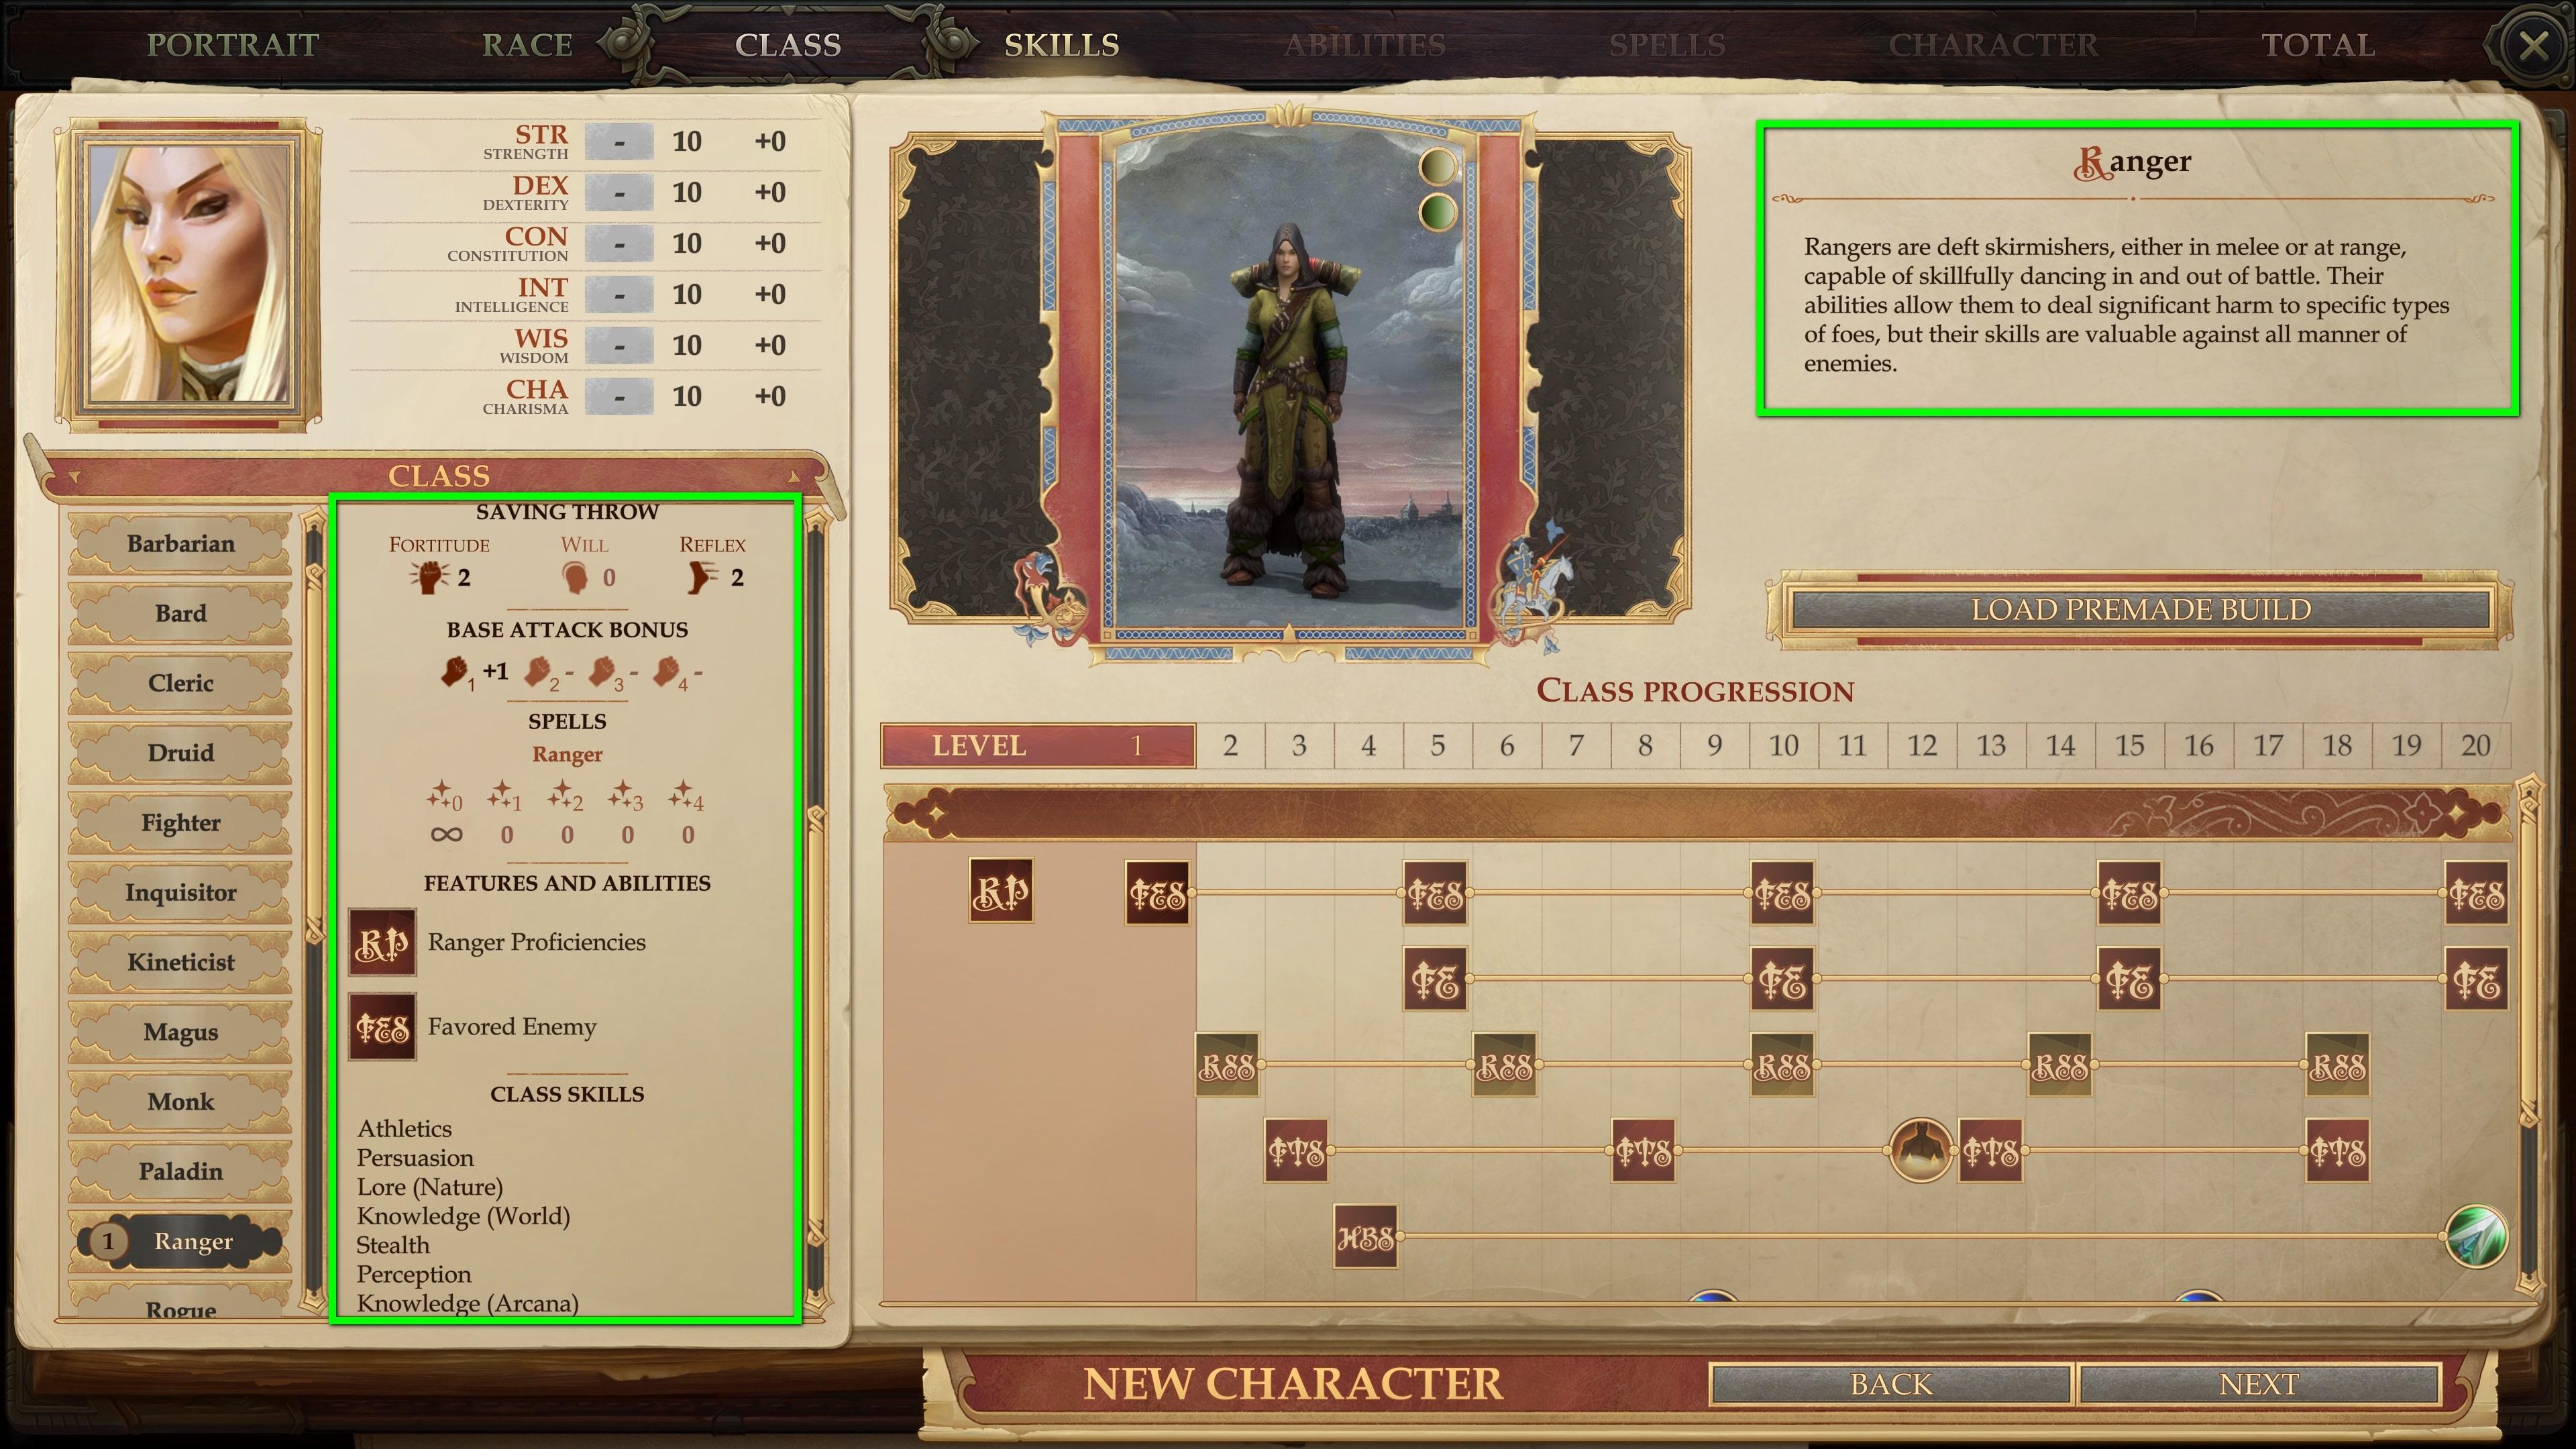 Read the descriptions of classes, races & skills carefully. © Owlcat Games